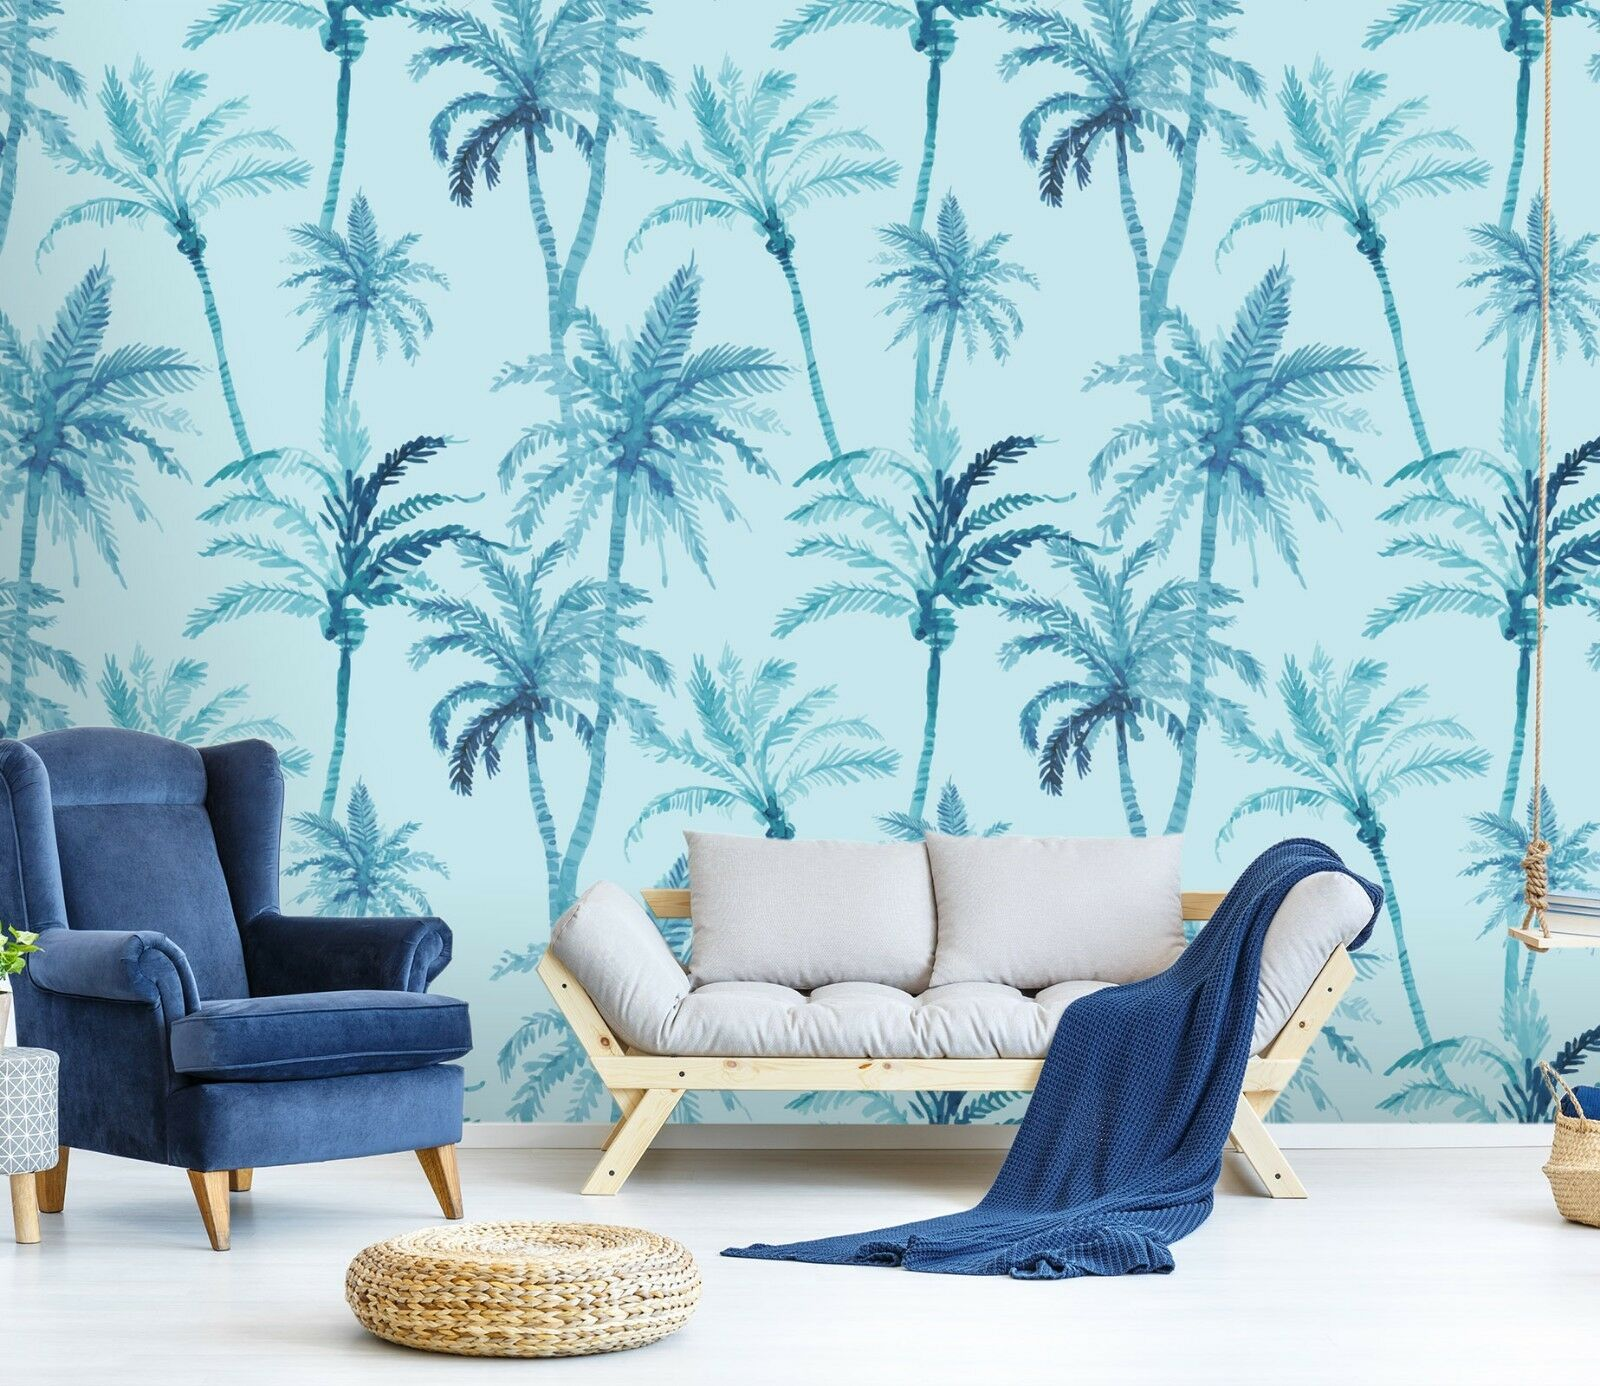 3D Kokosnuss Baum Blau 21 Tapete Wandgemälde Tapete Tapeten Familie Kinde DE